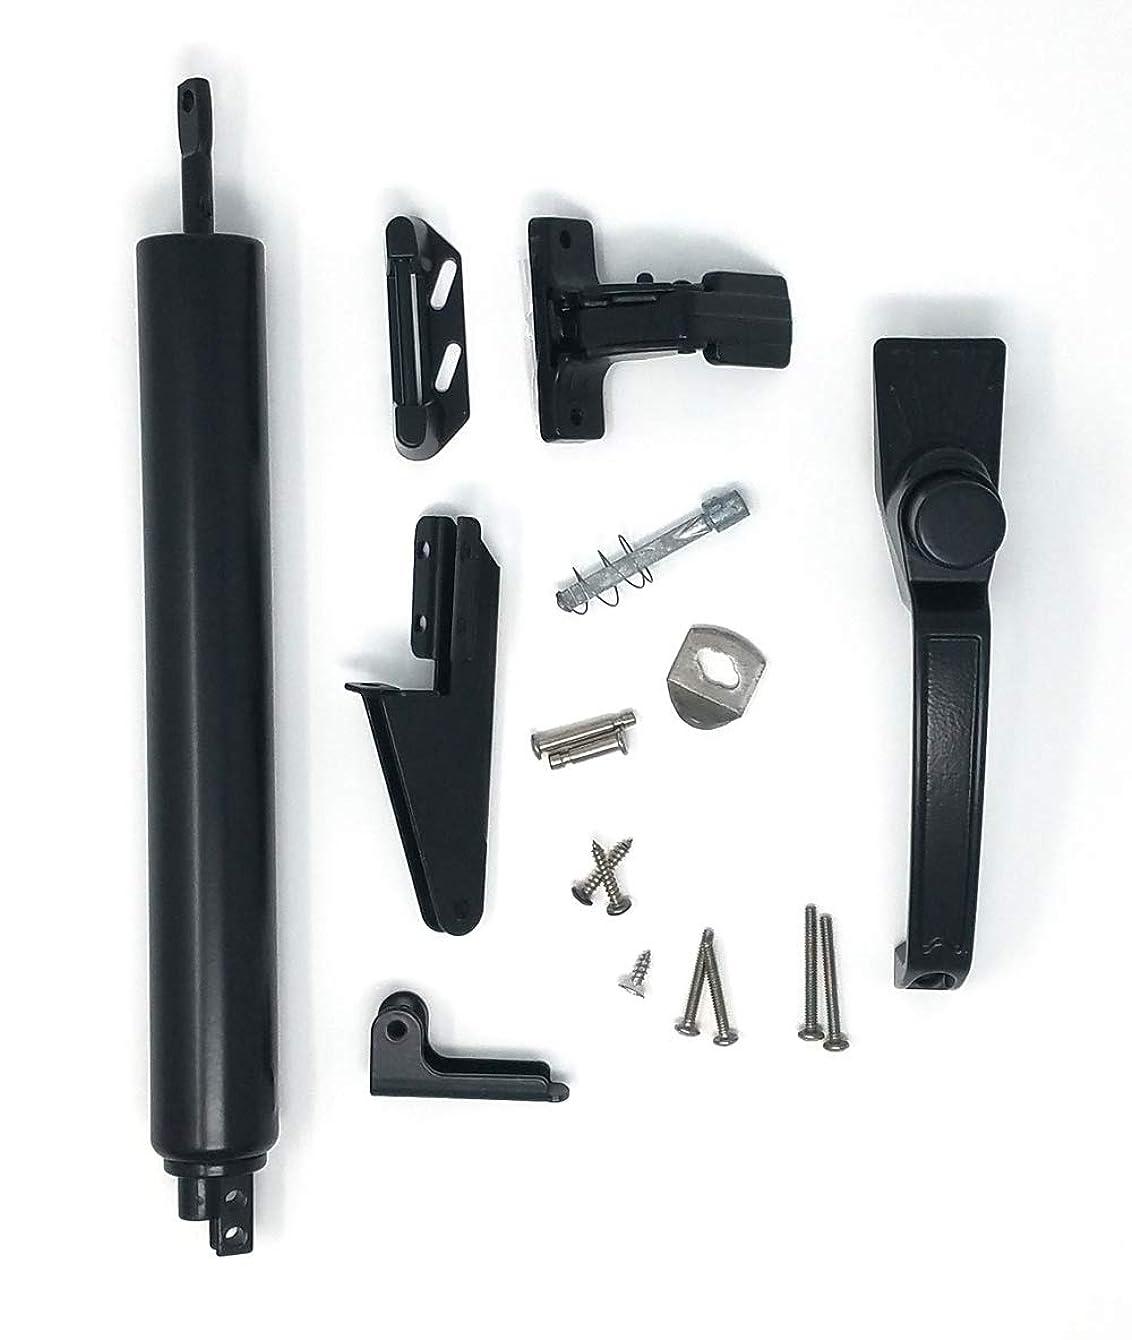 Suncoast Hardware Screen/Storm Door Closer Kit Stainless Steel Rod Accessories - Black